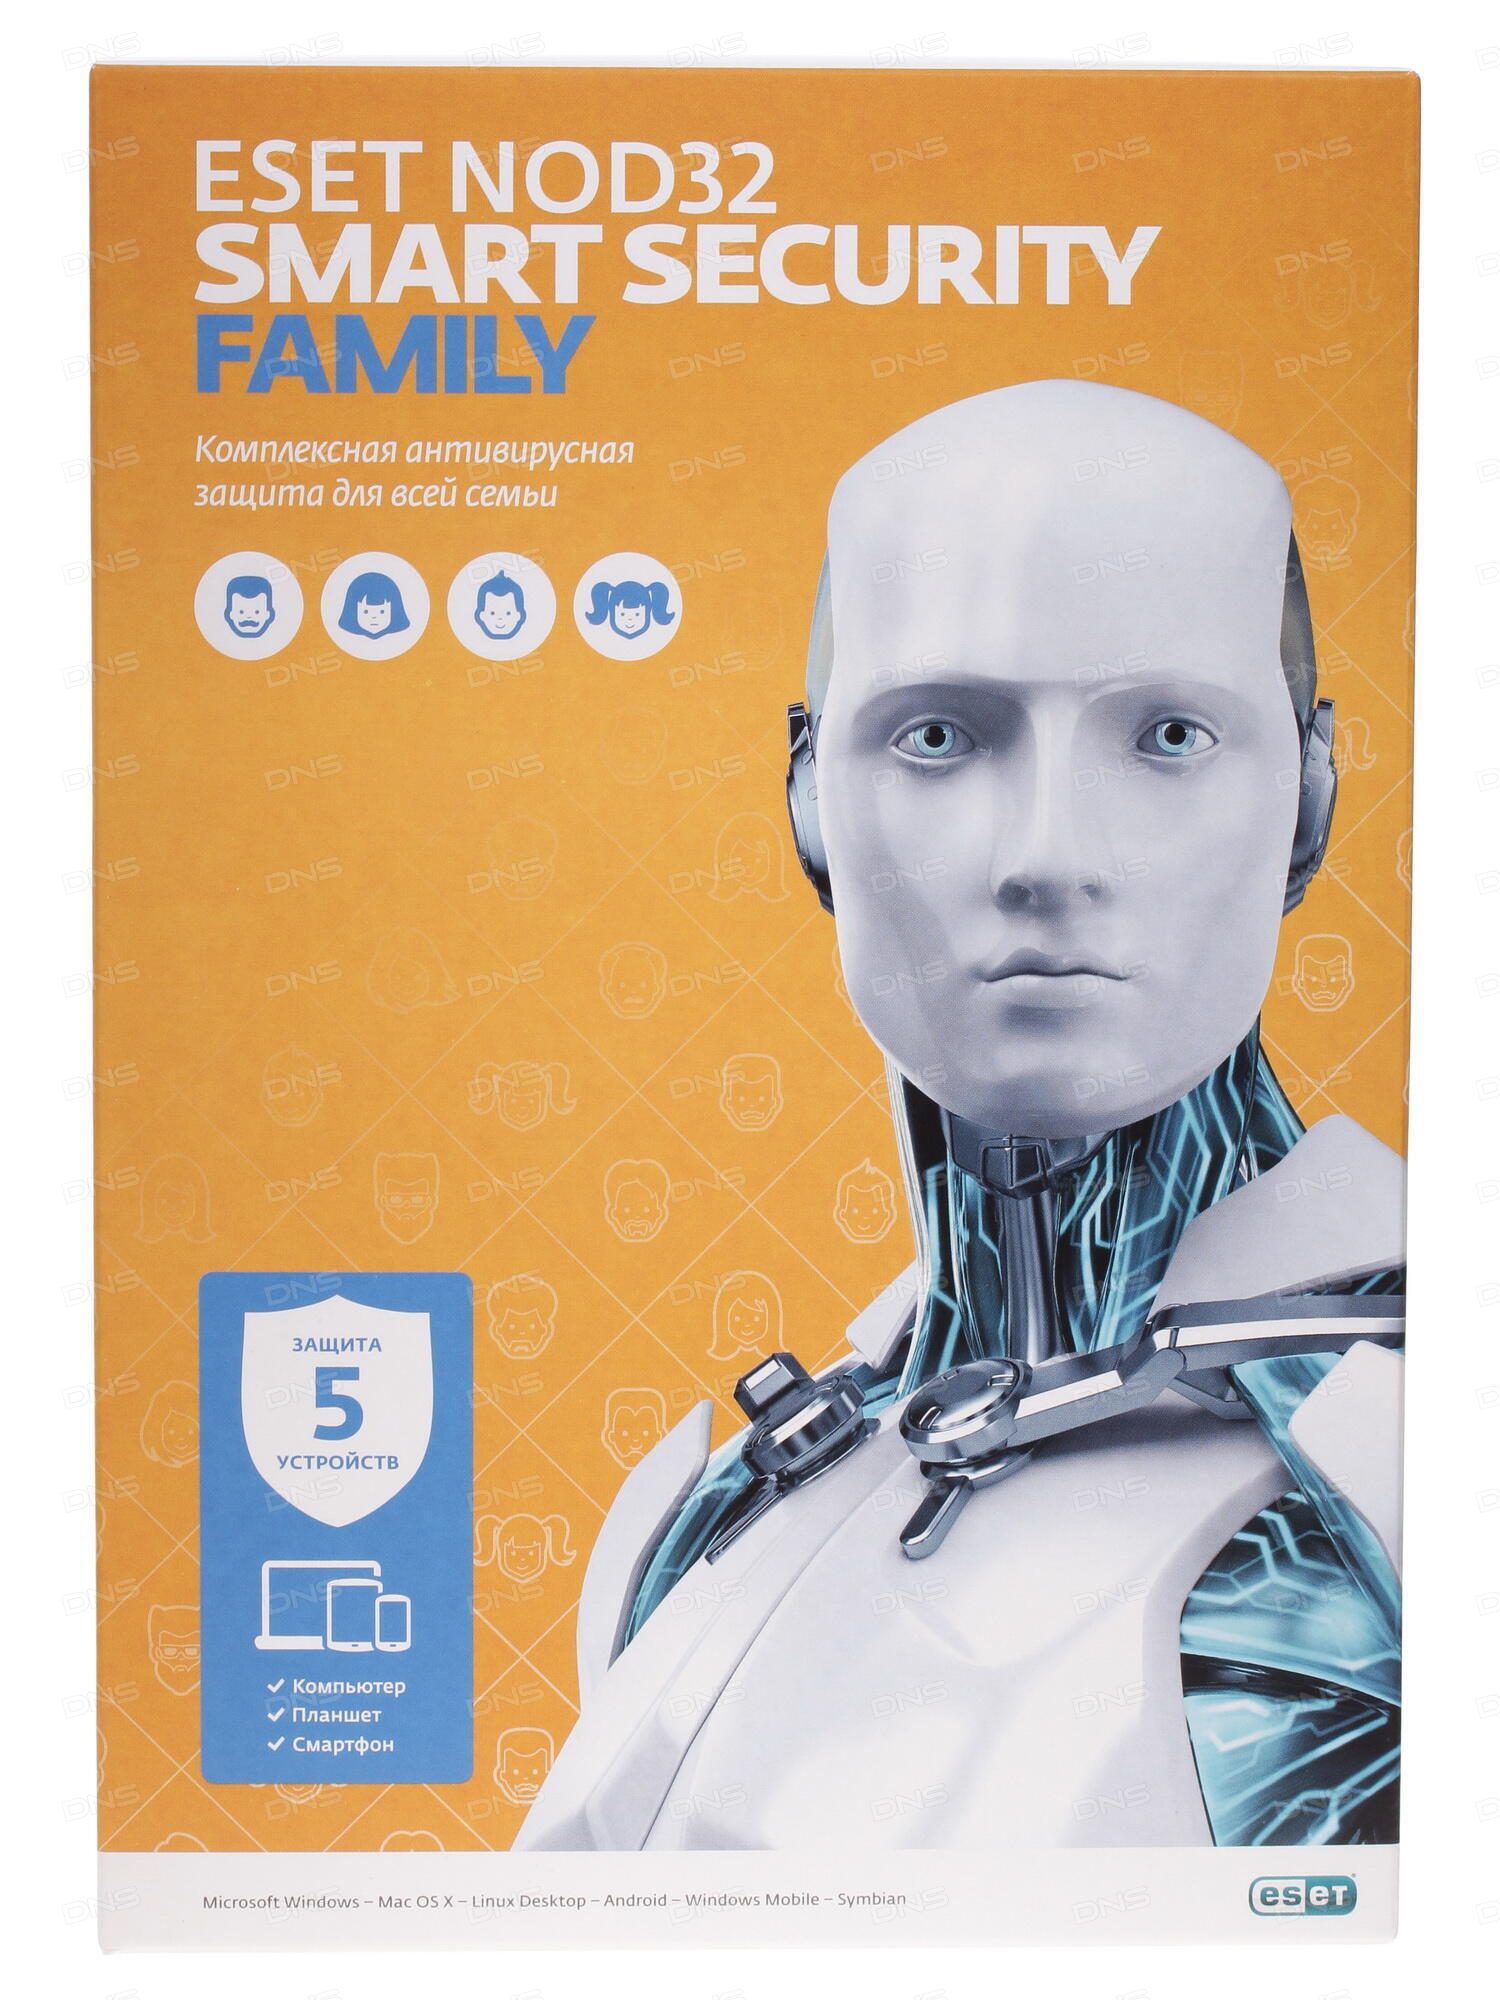 Eset Smart Security 10 Premium Key 2018 >> Eset smart security 7 64 bit activation key